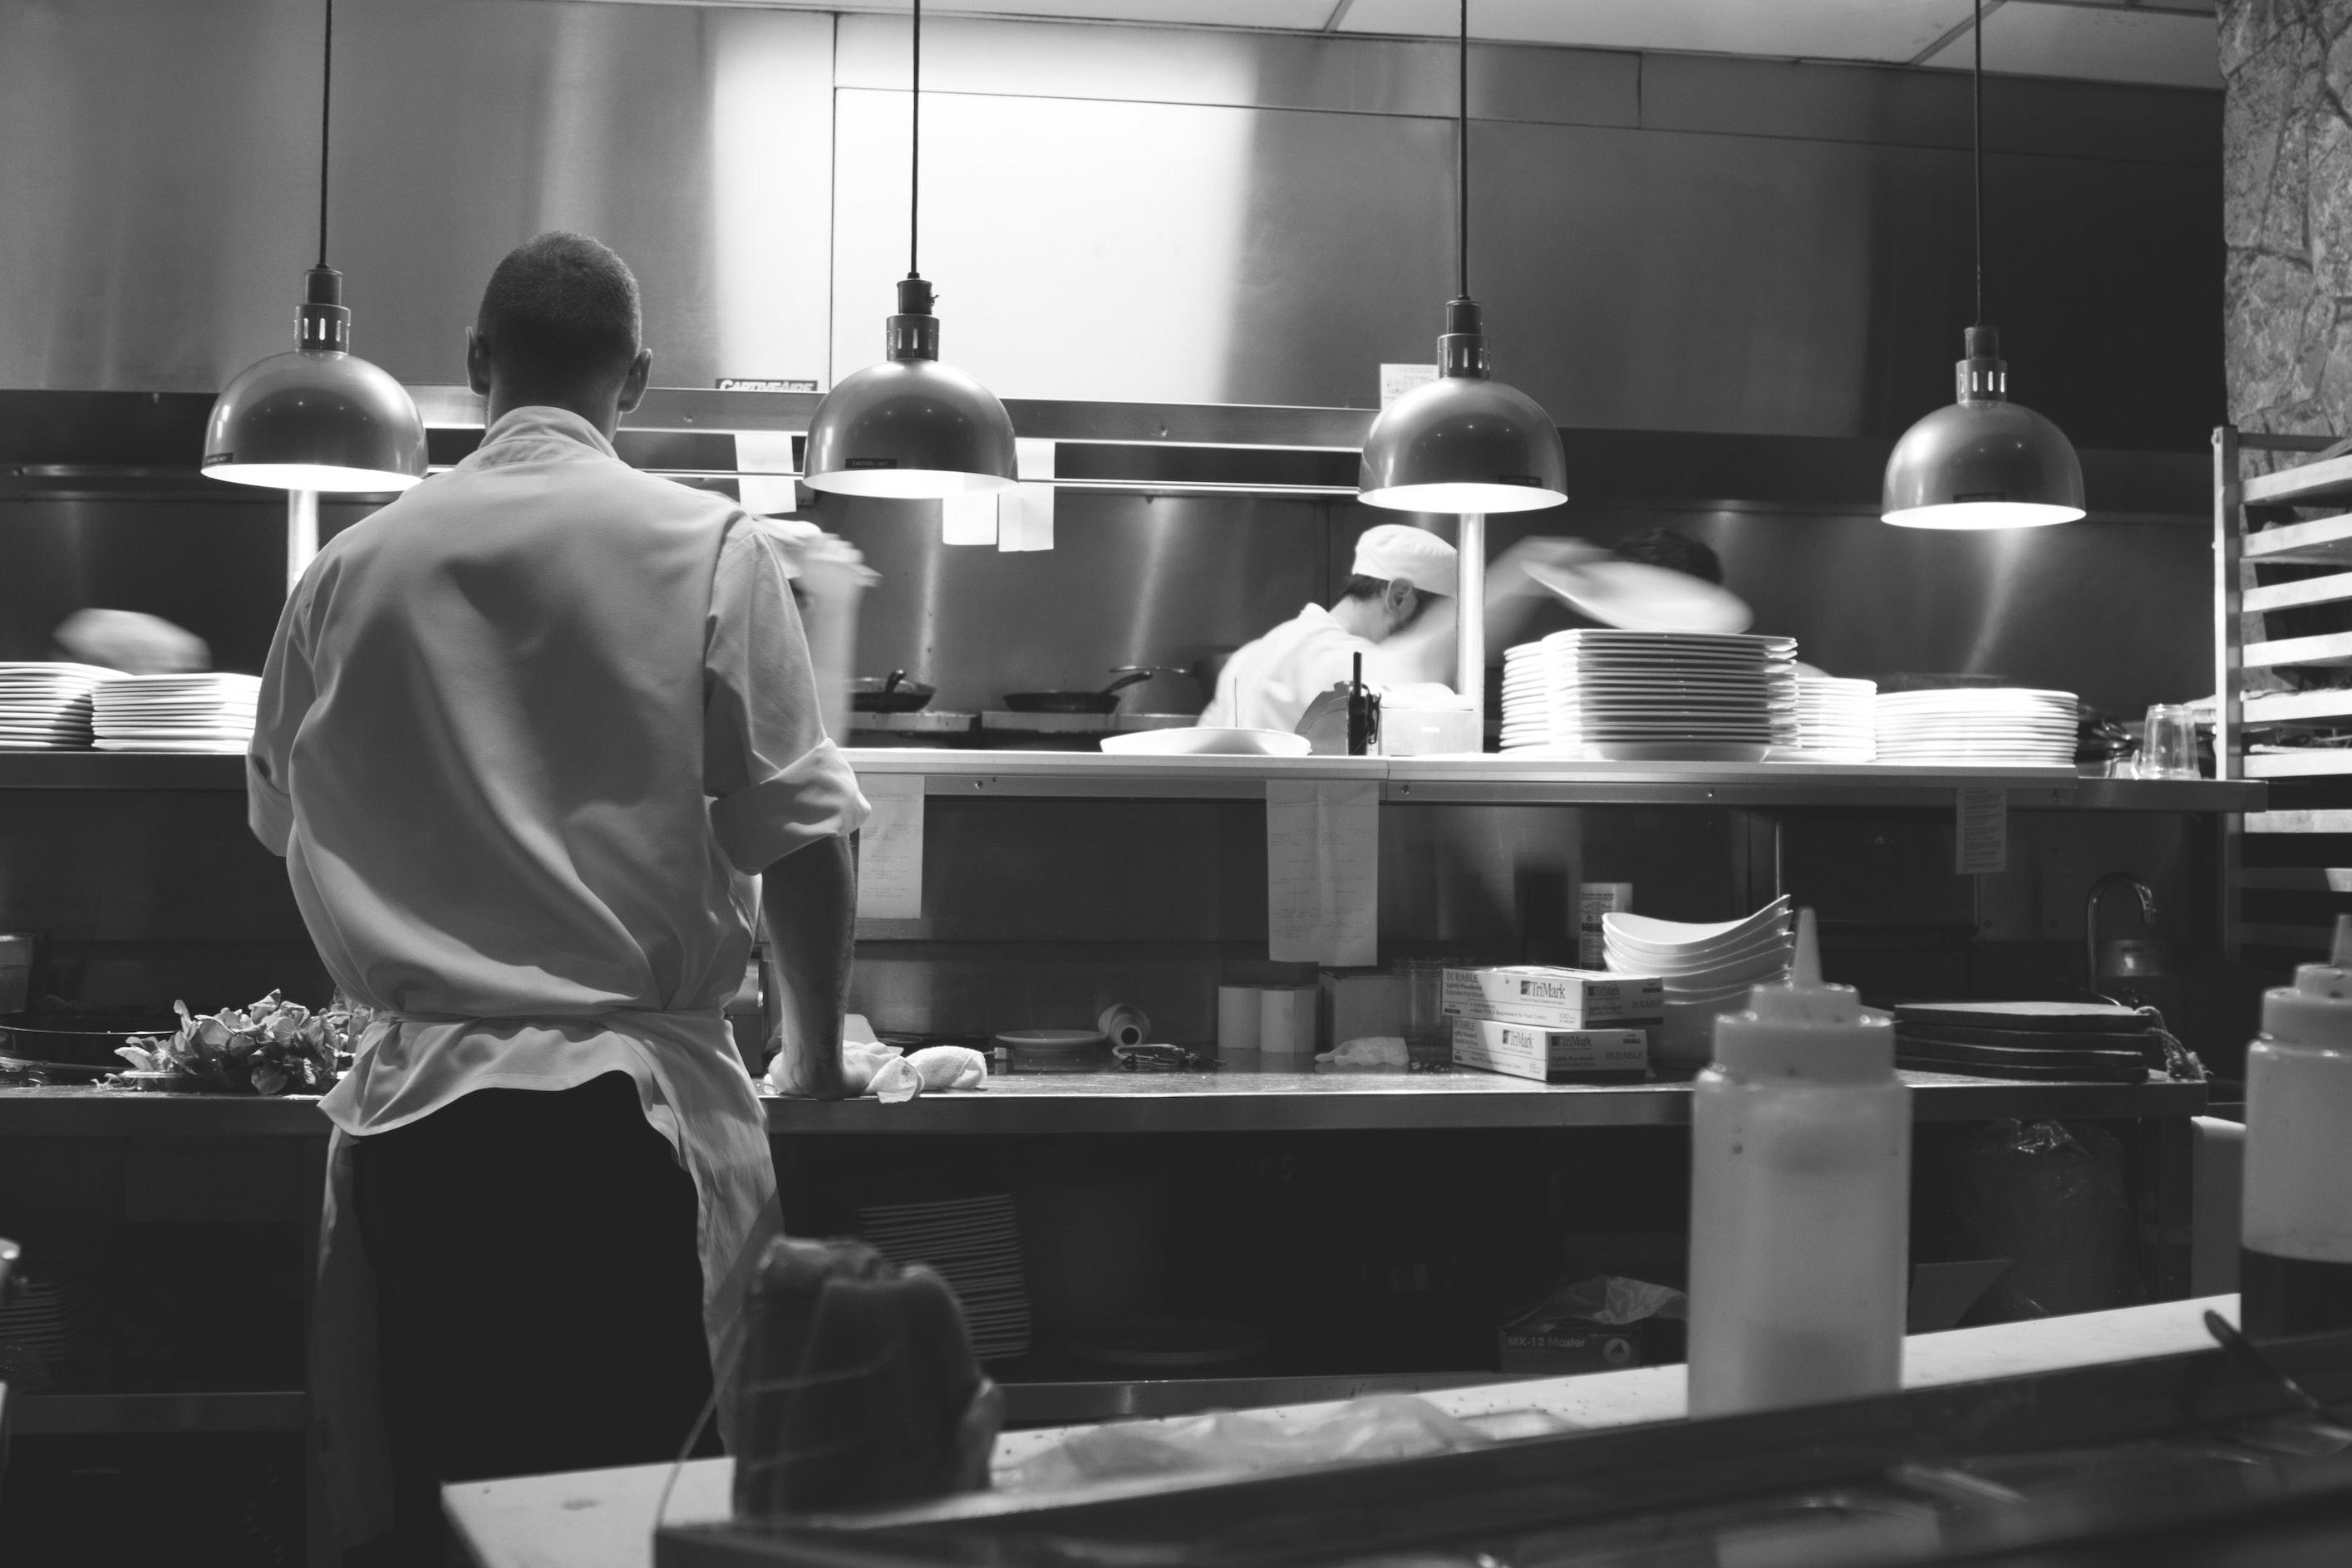 Chefs at Work, photo by https://unsplash.com/@michaelwb